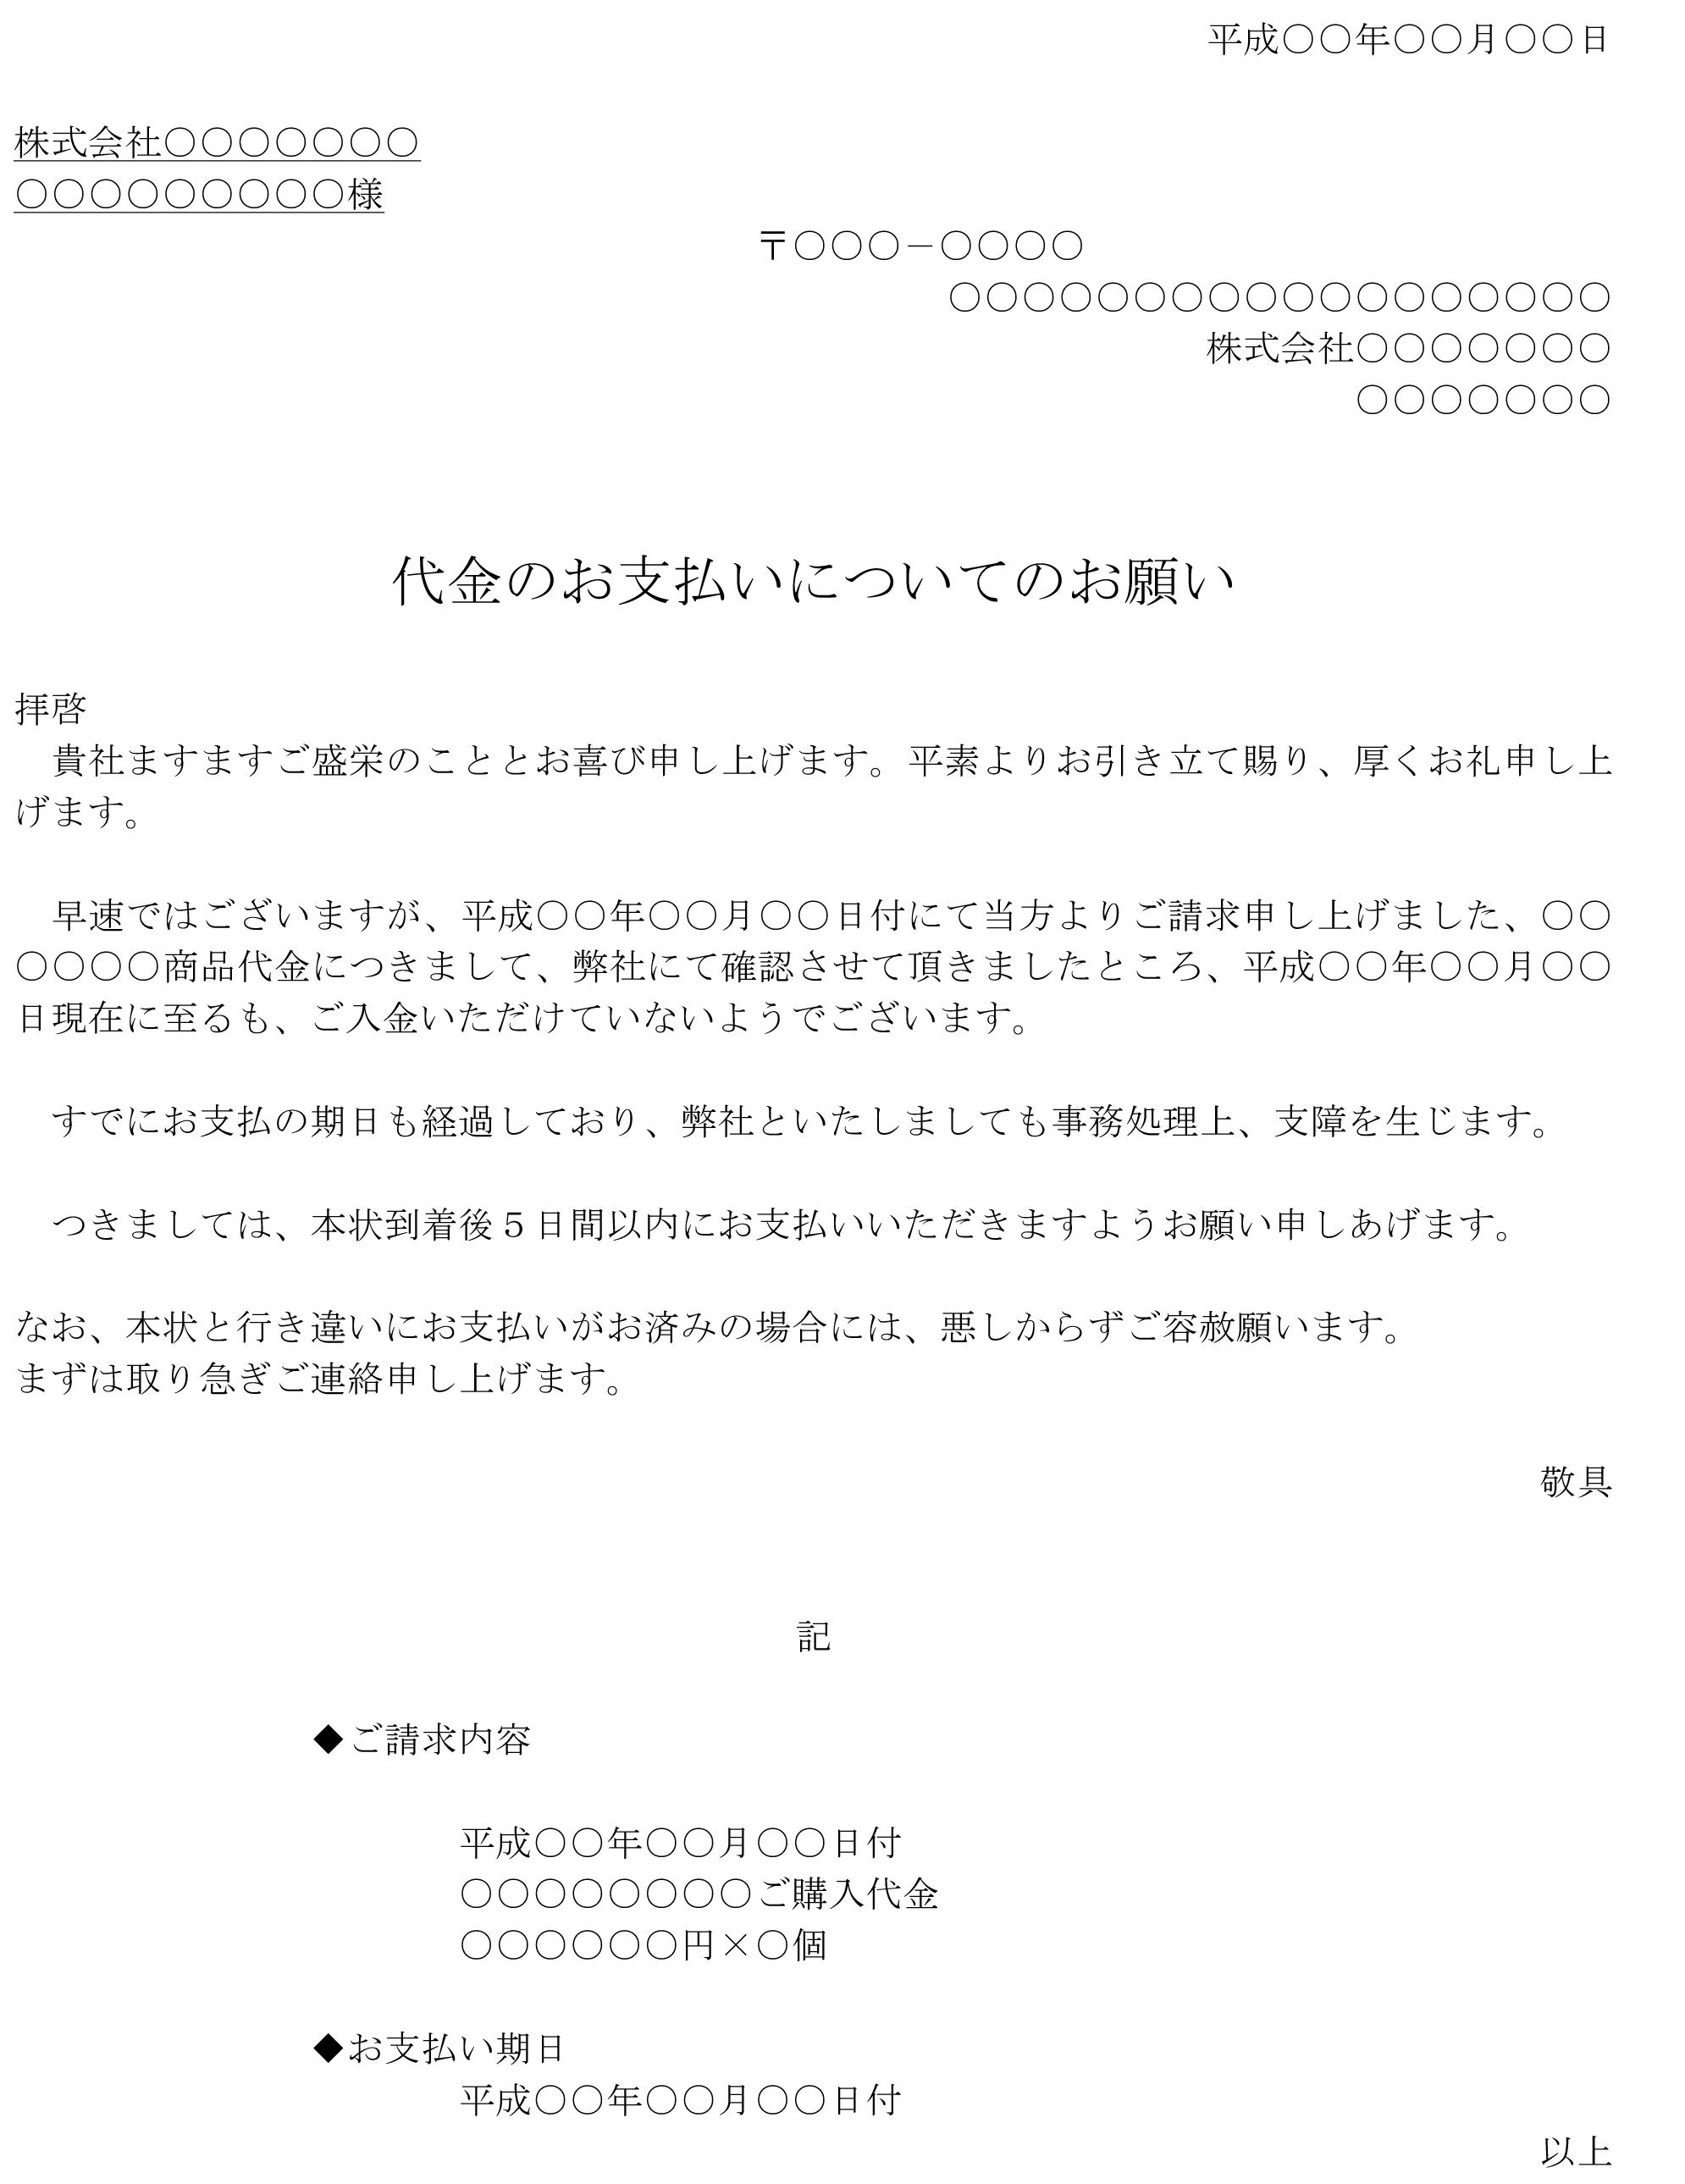 督促状(代金支払い)02